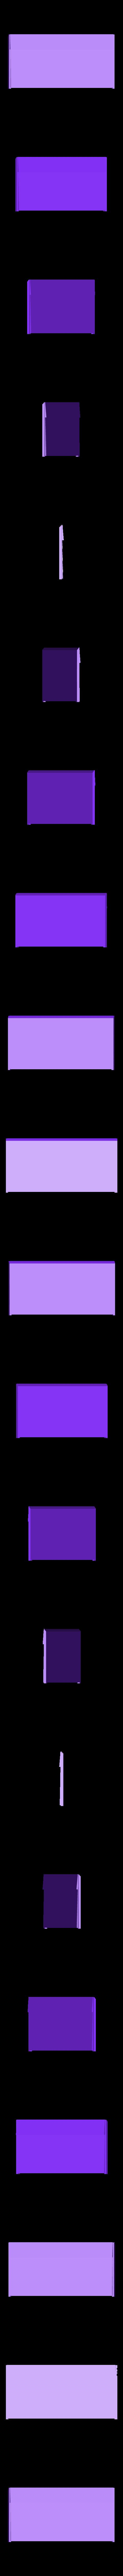 r_barn_roof.stl Télécharger fichier STL gratuit Saxon Barn 2 • Objet imprimable en 3D, Earsling